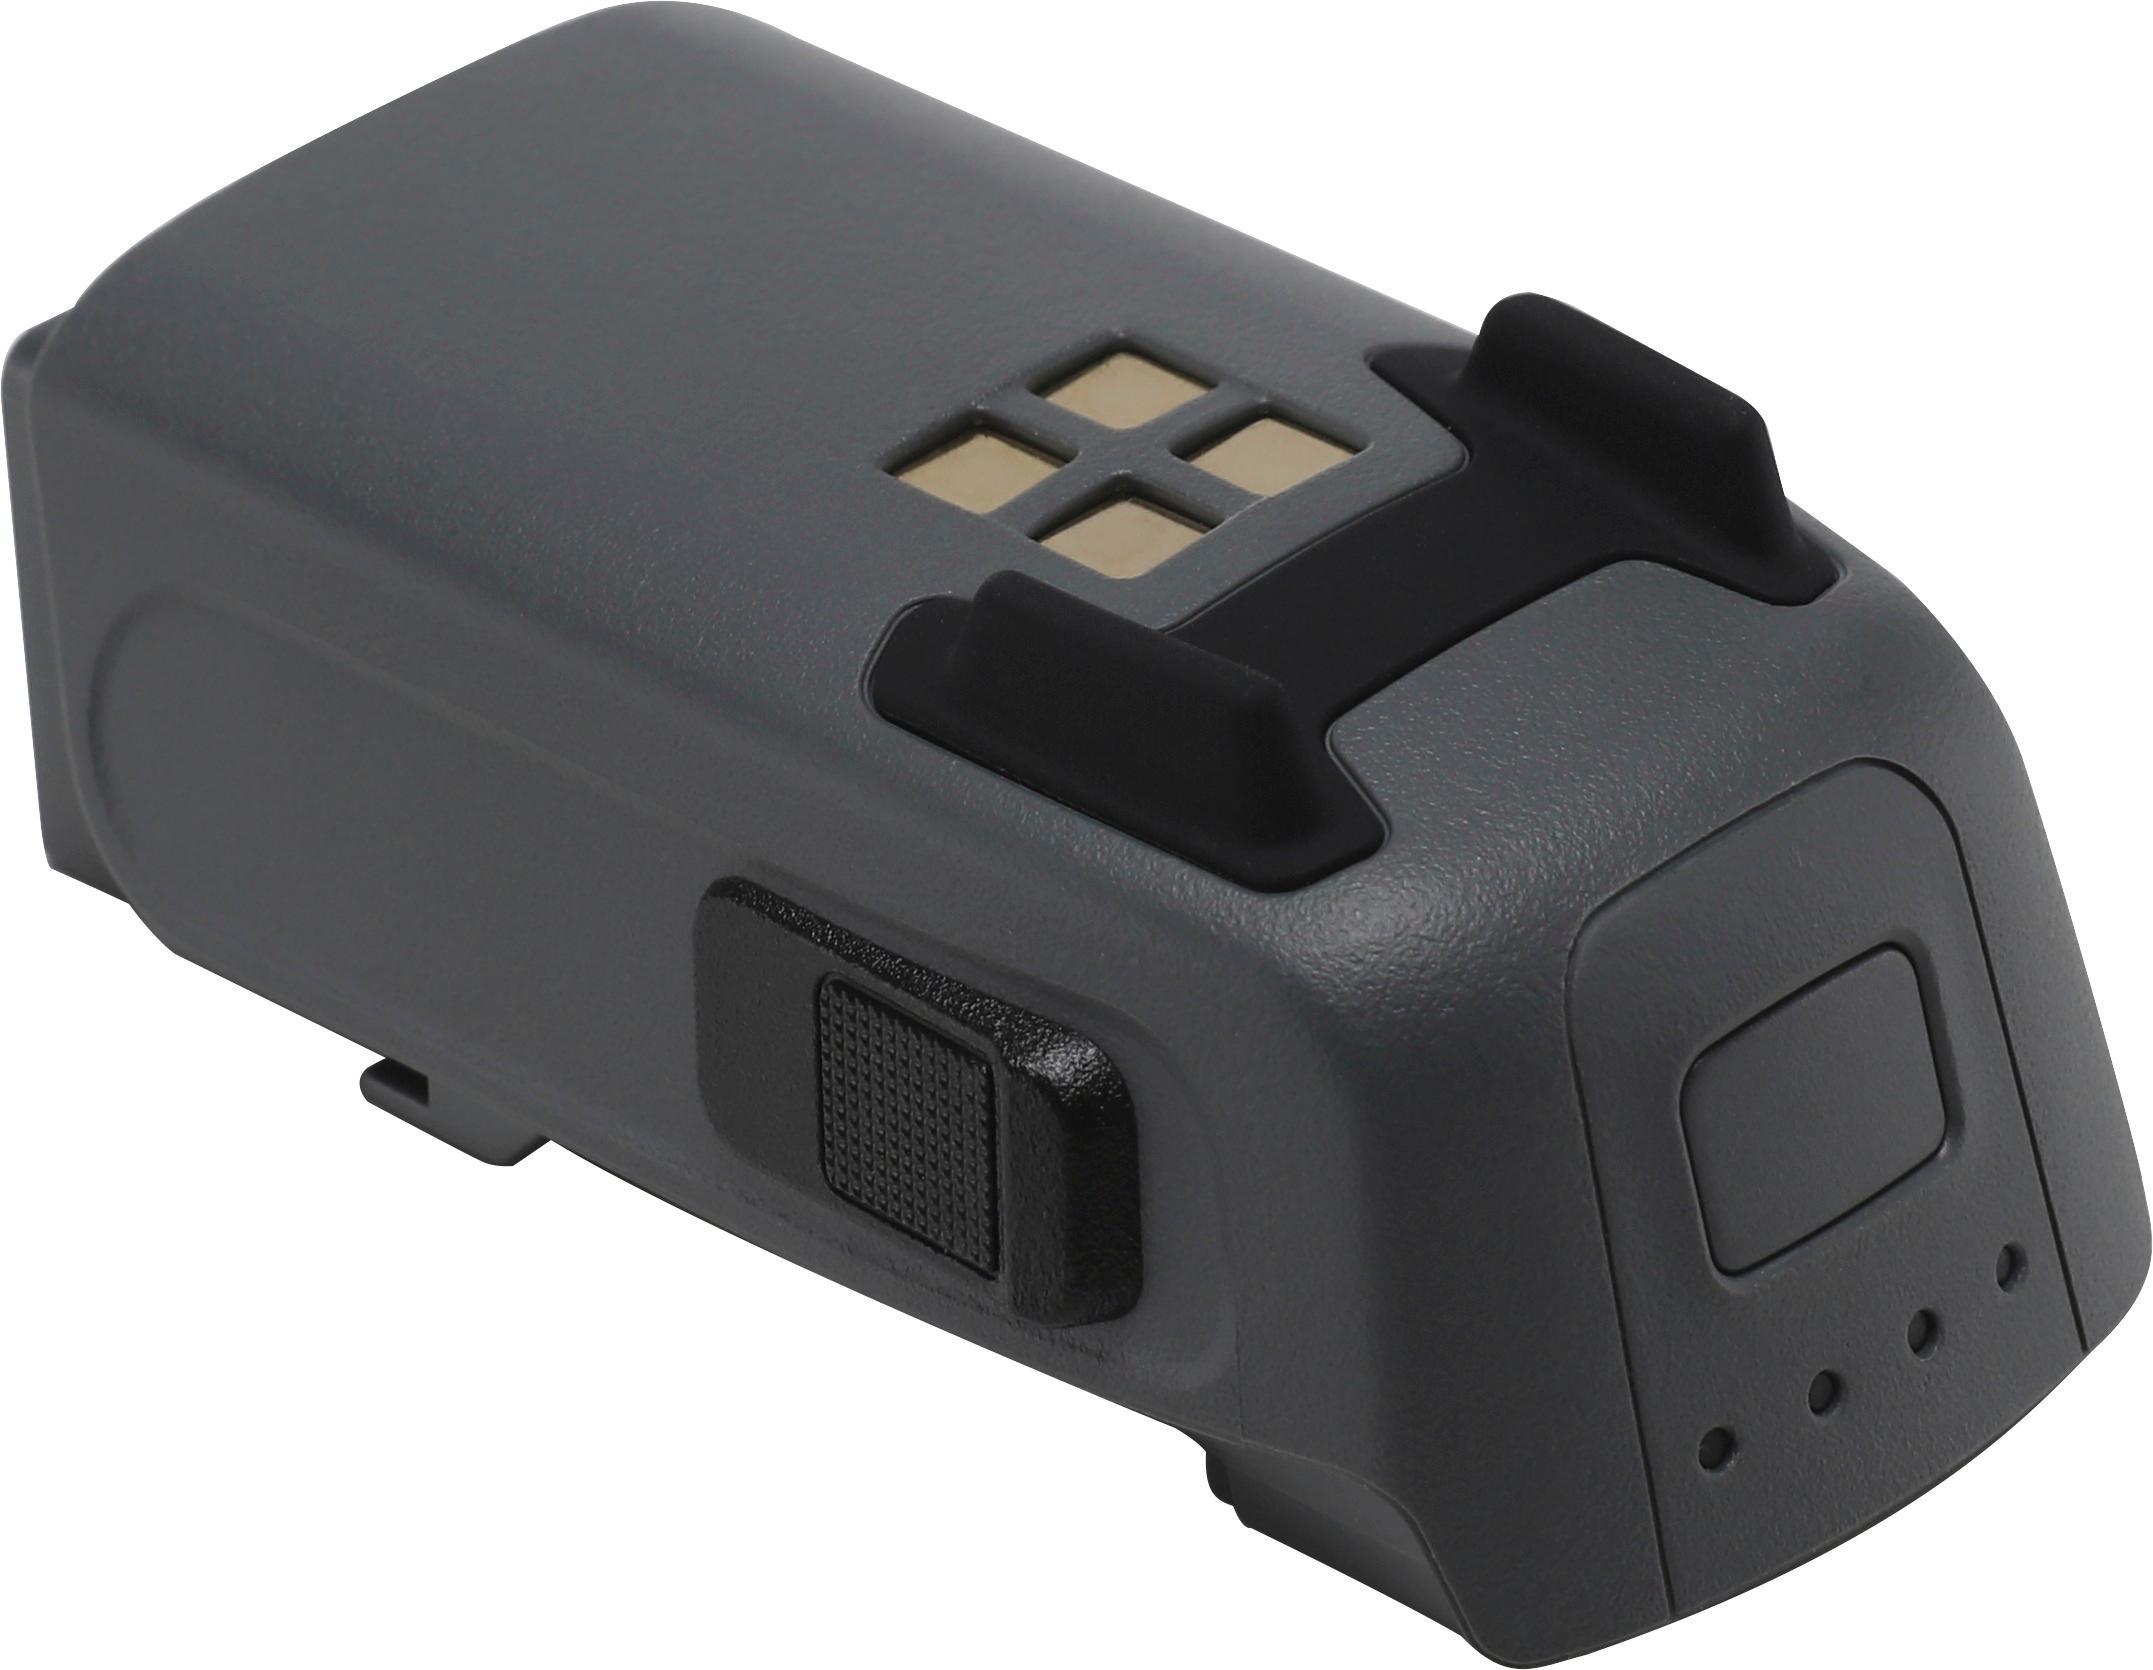 DJI CP.PT.000789 Intelligent Flight Battery for Spark